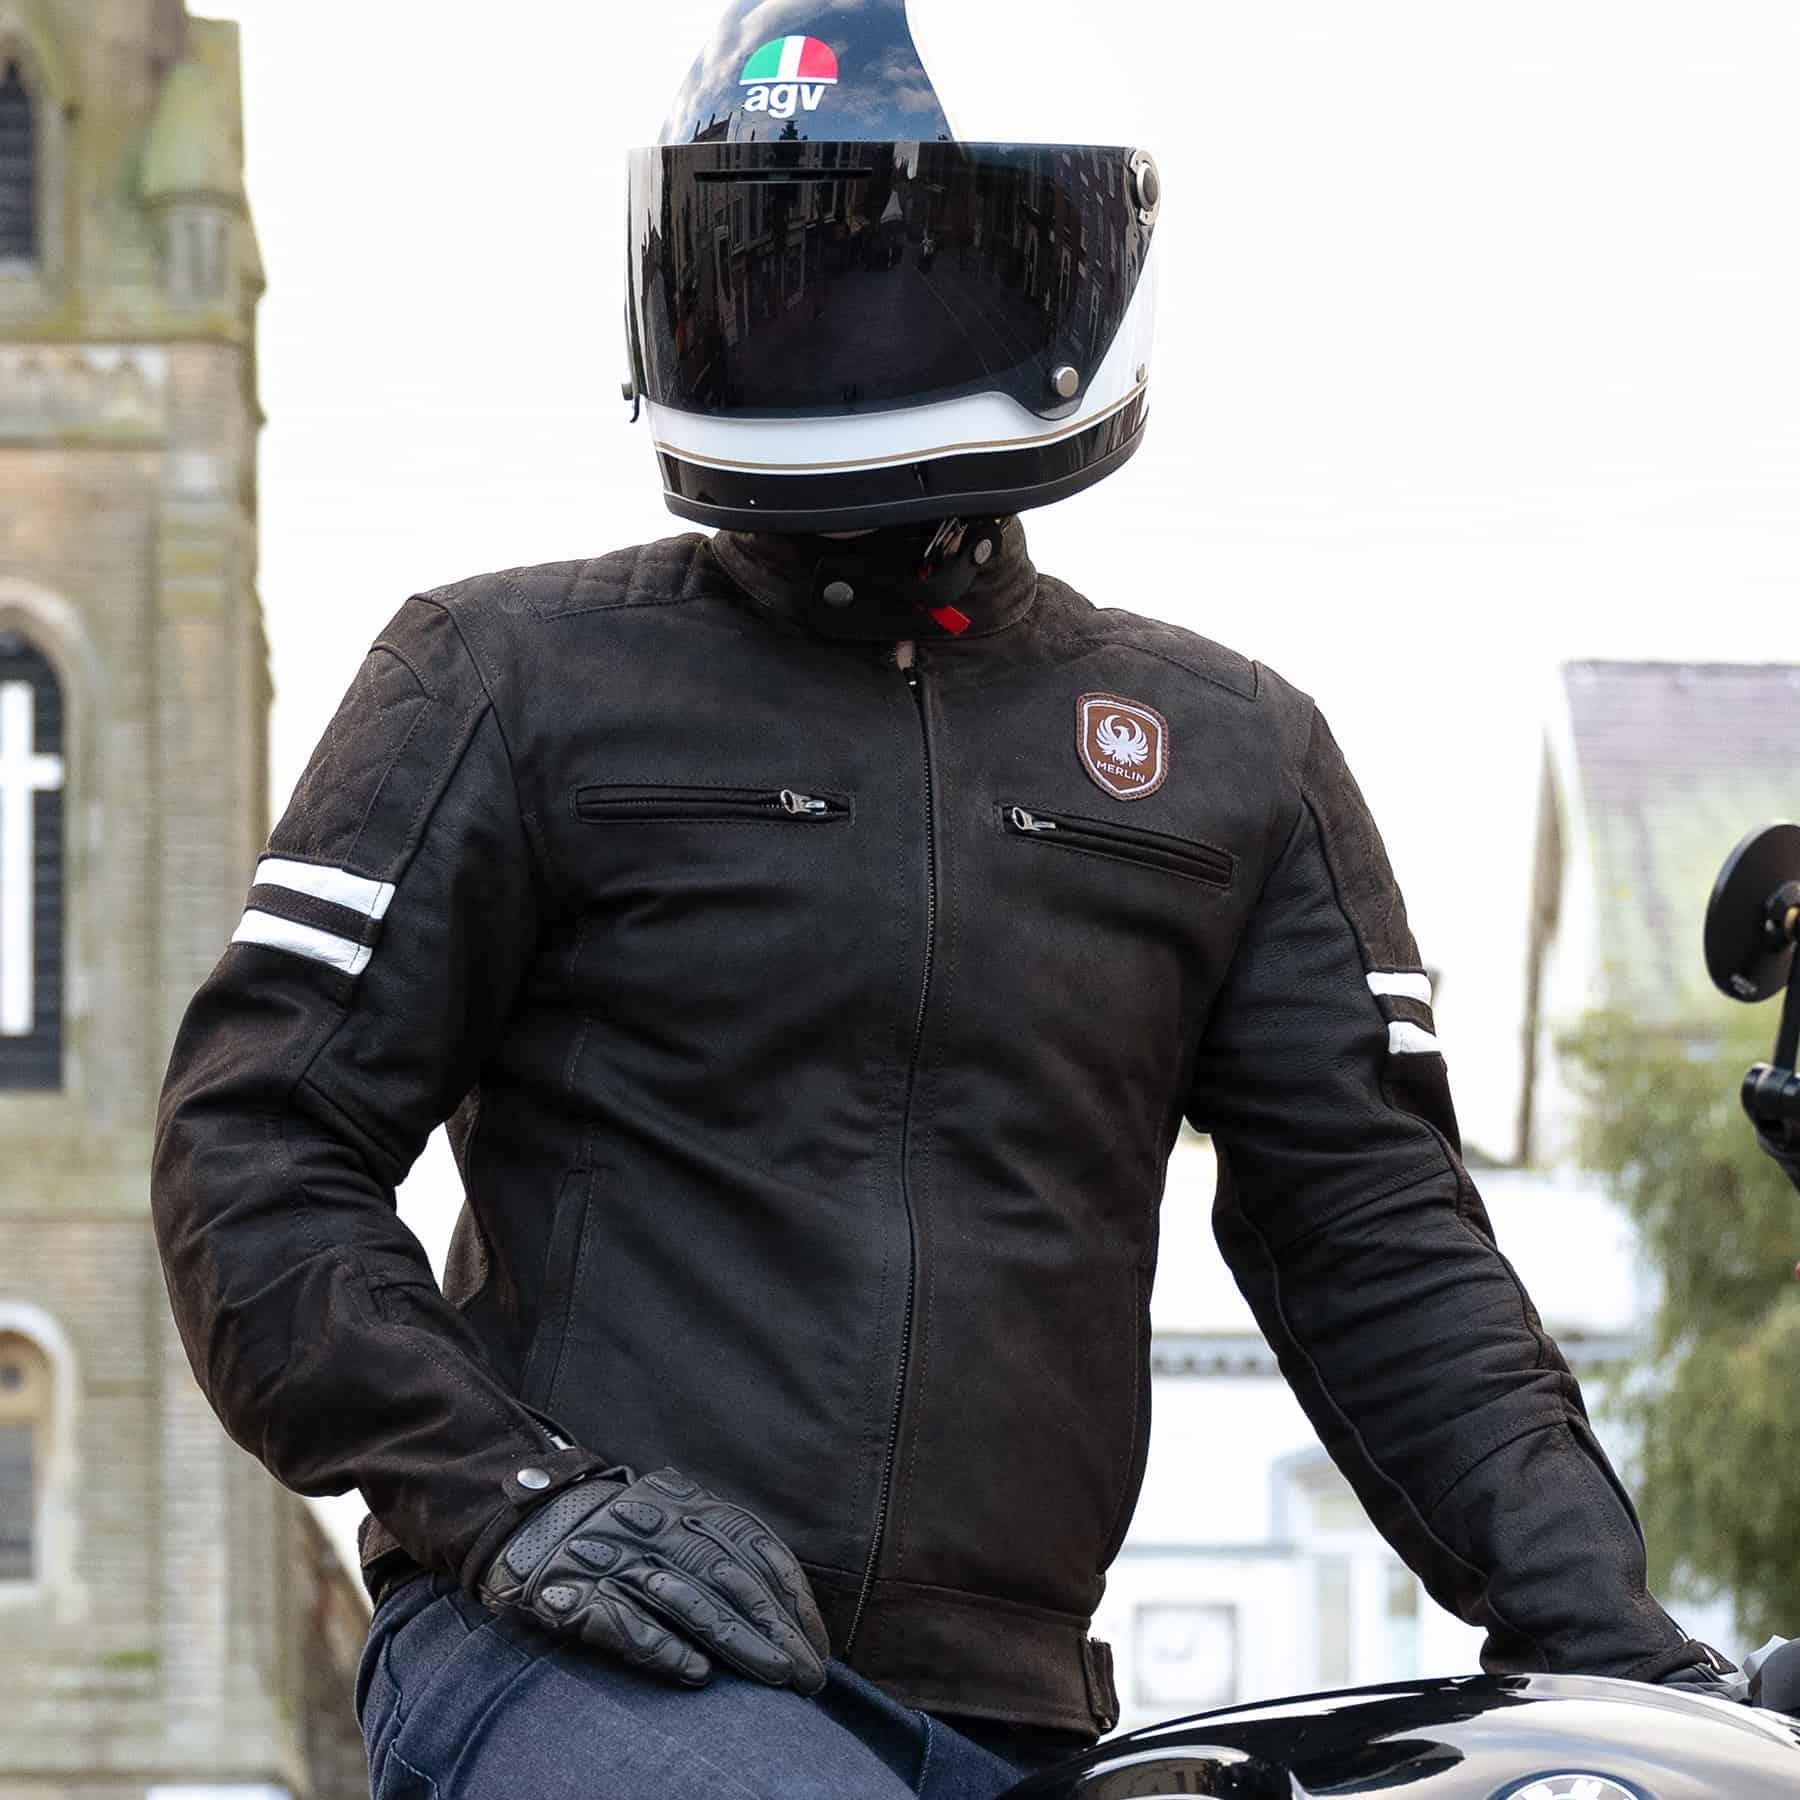 Merlin Hixon leather jacket in brown lifestyle image